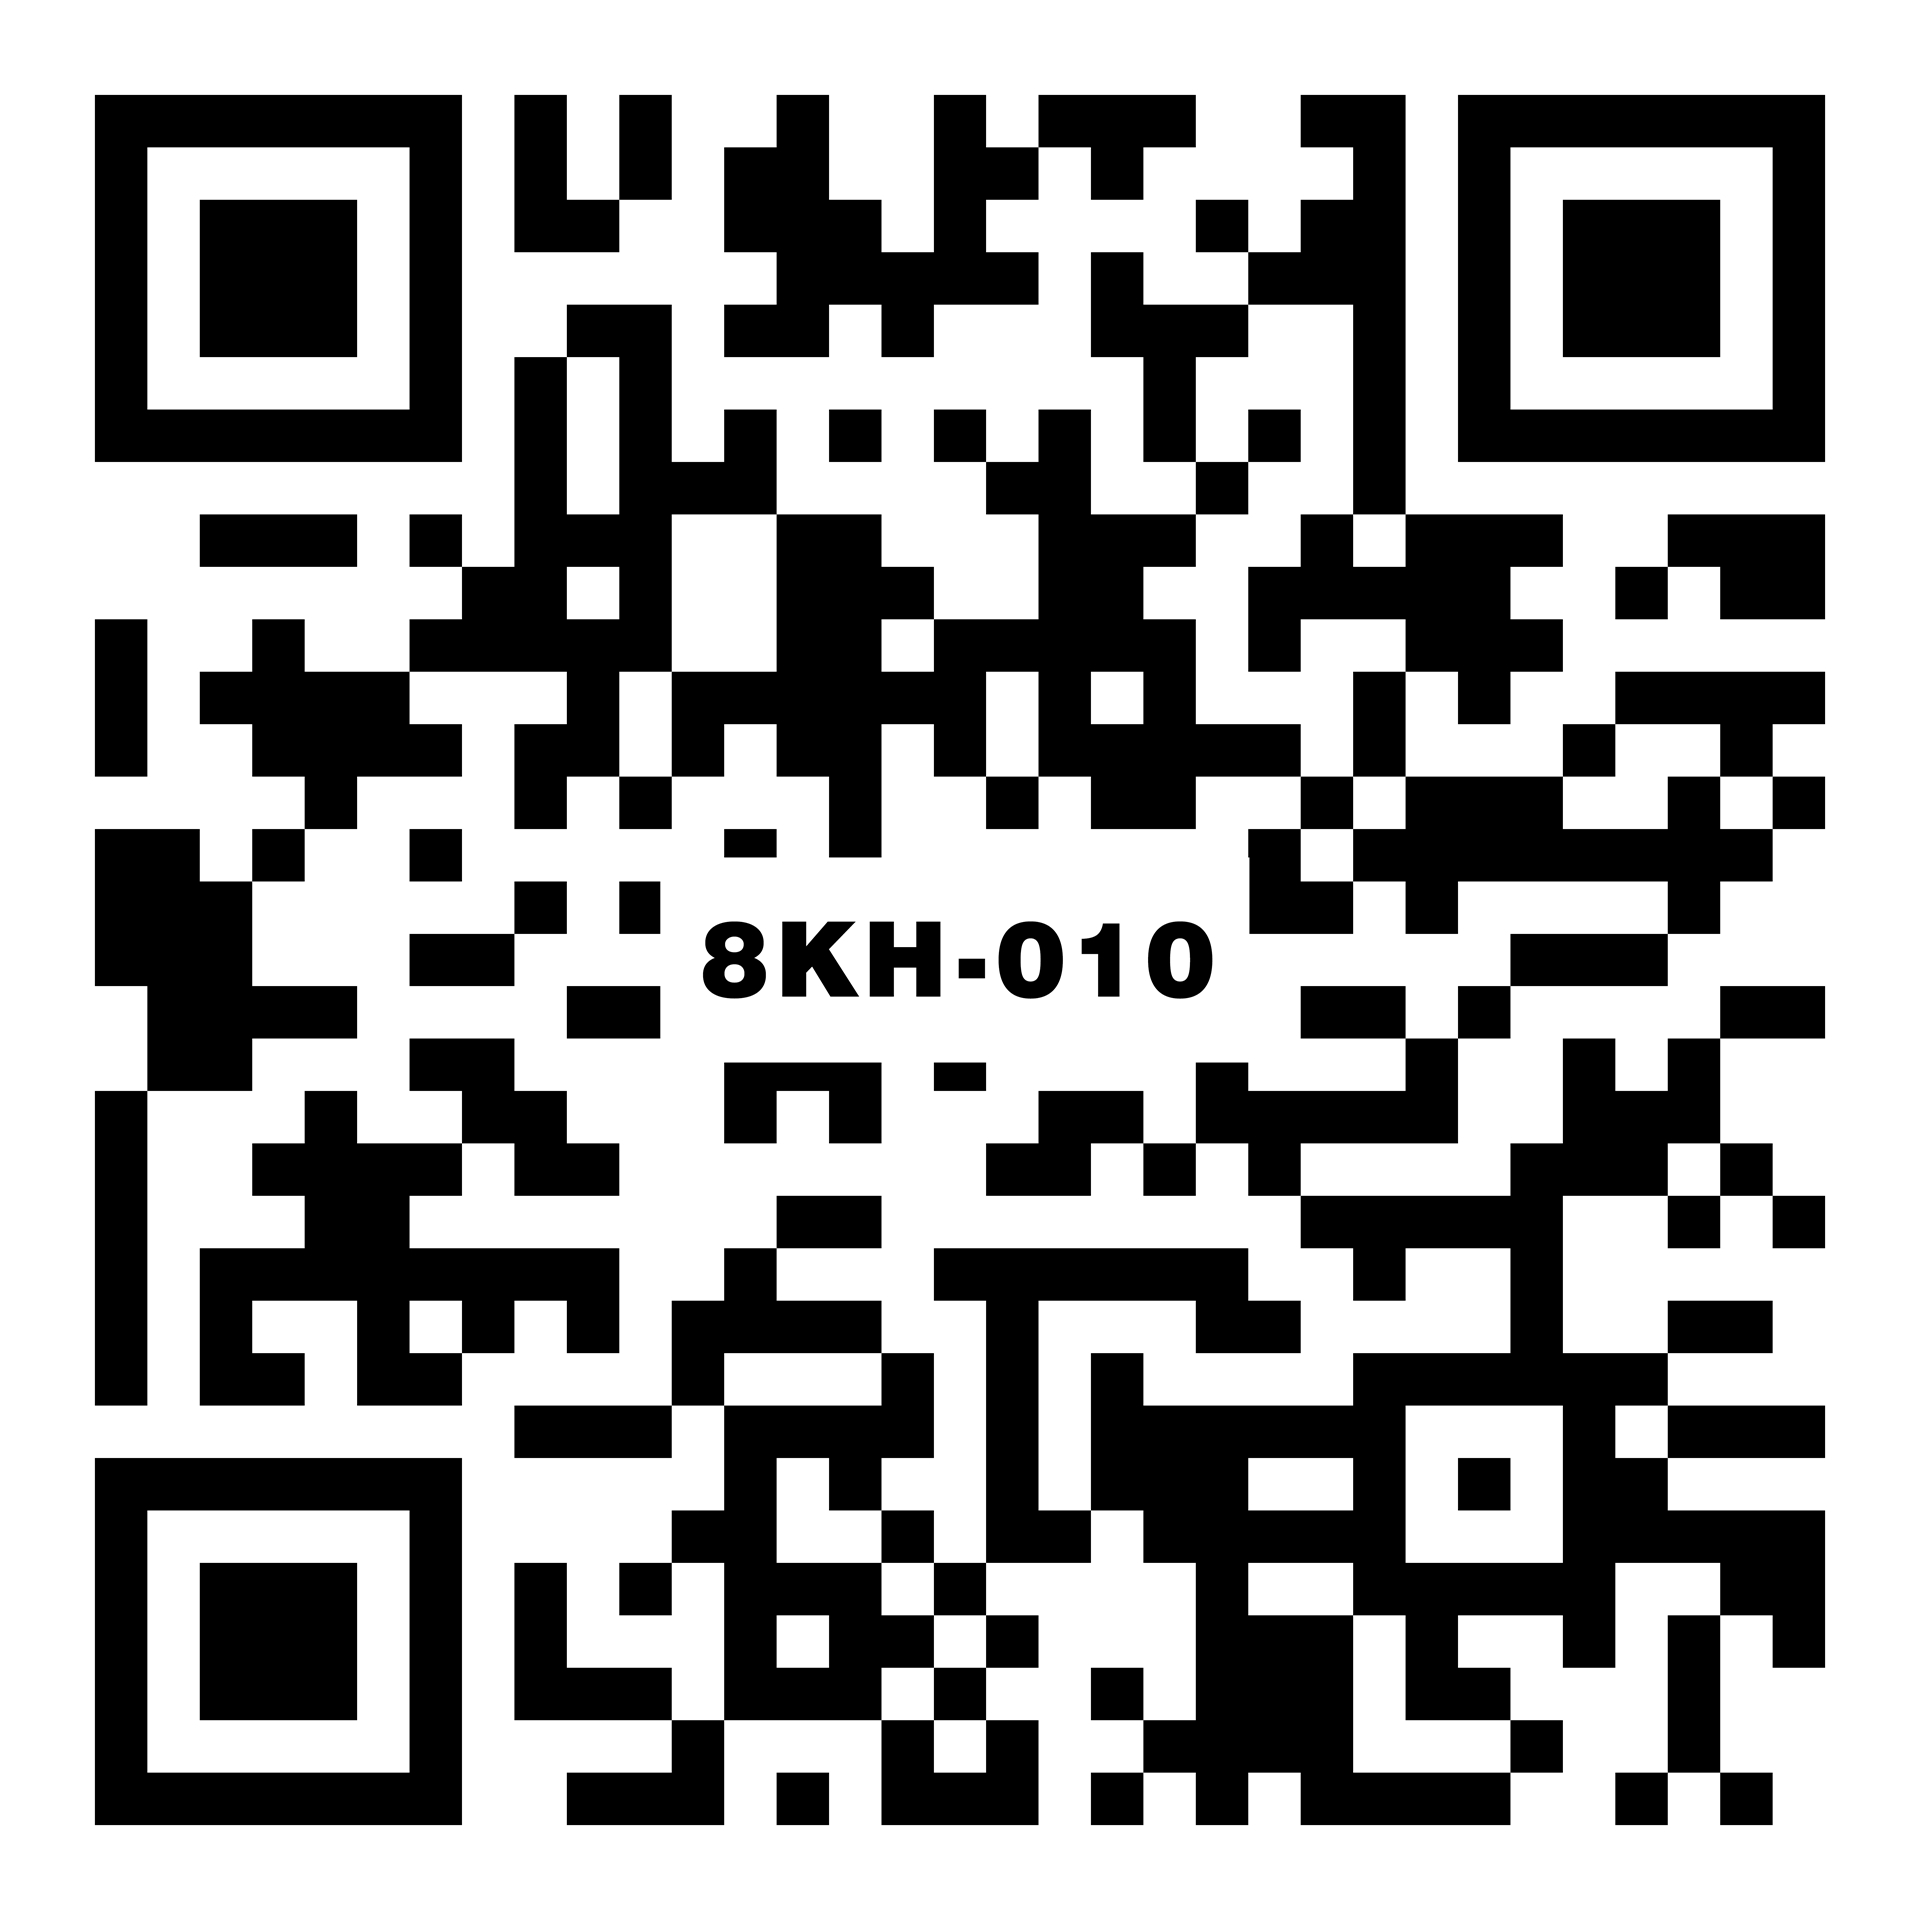 8KH-010